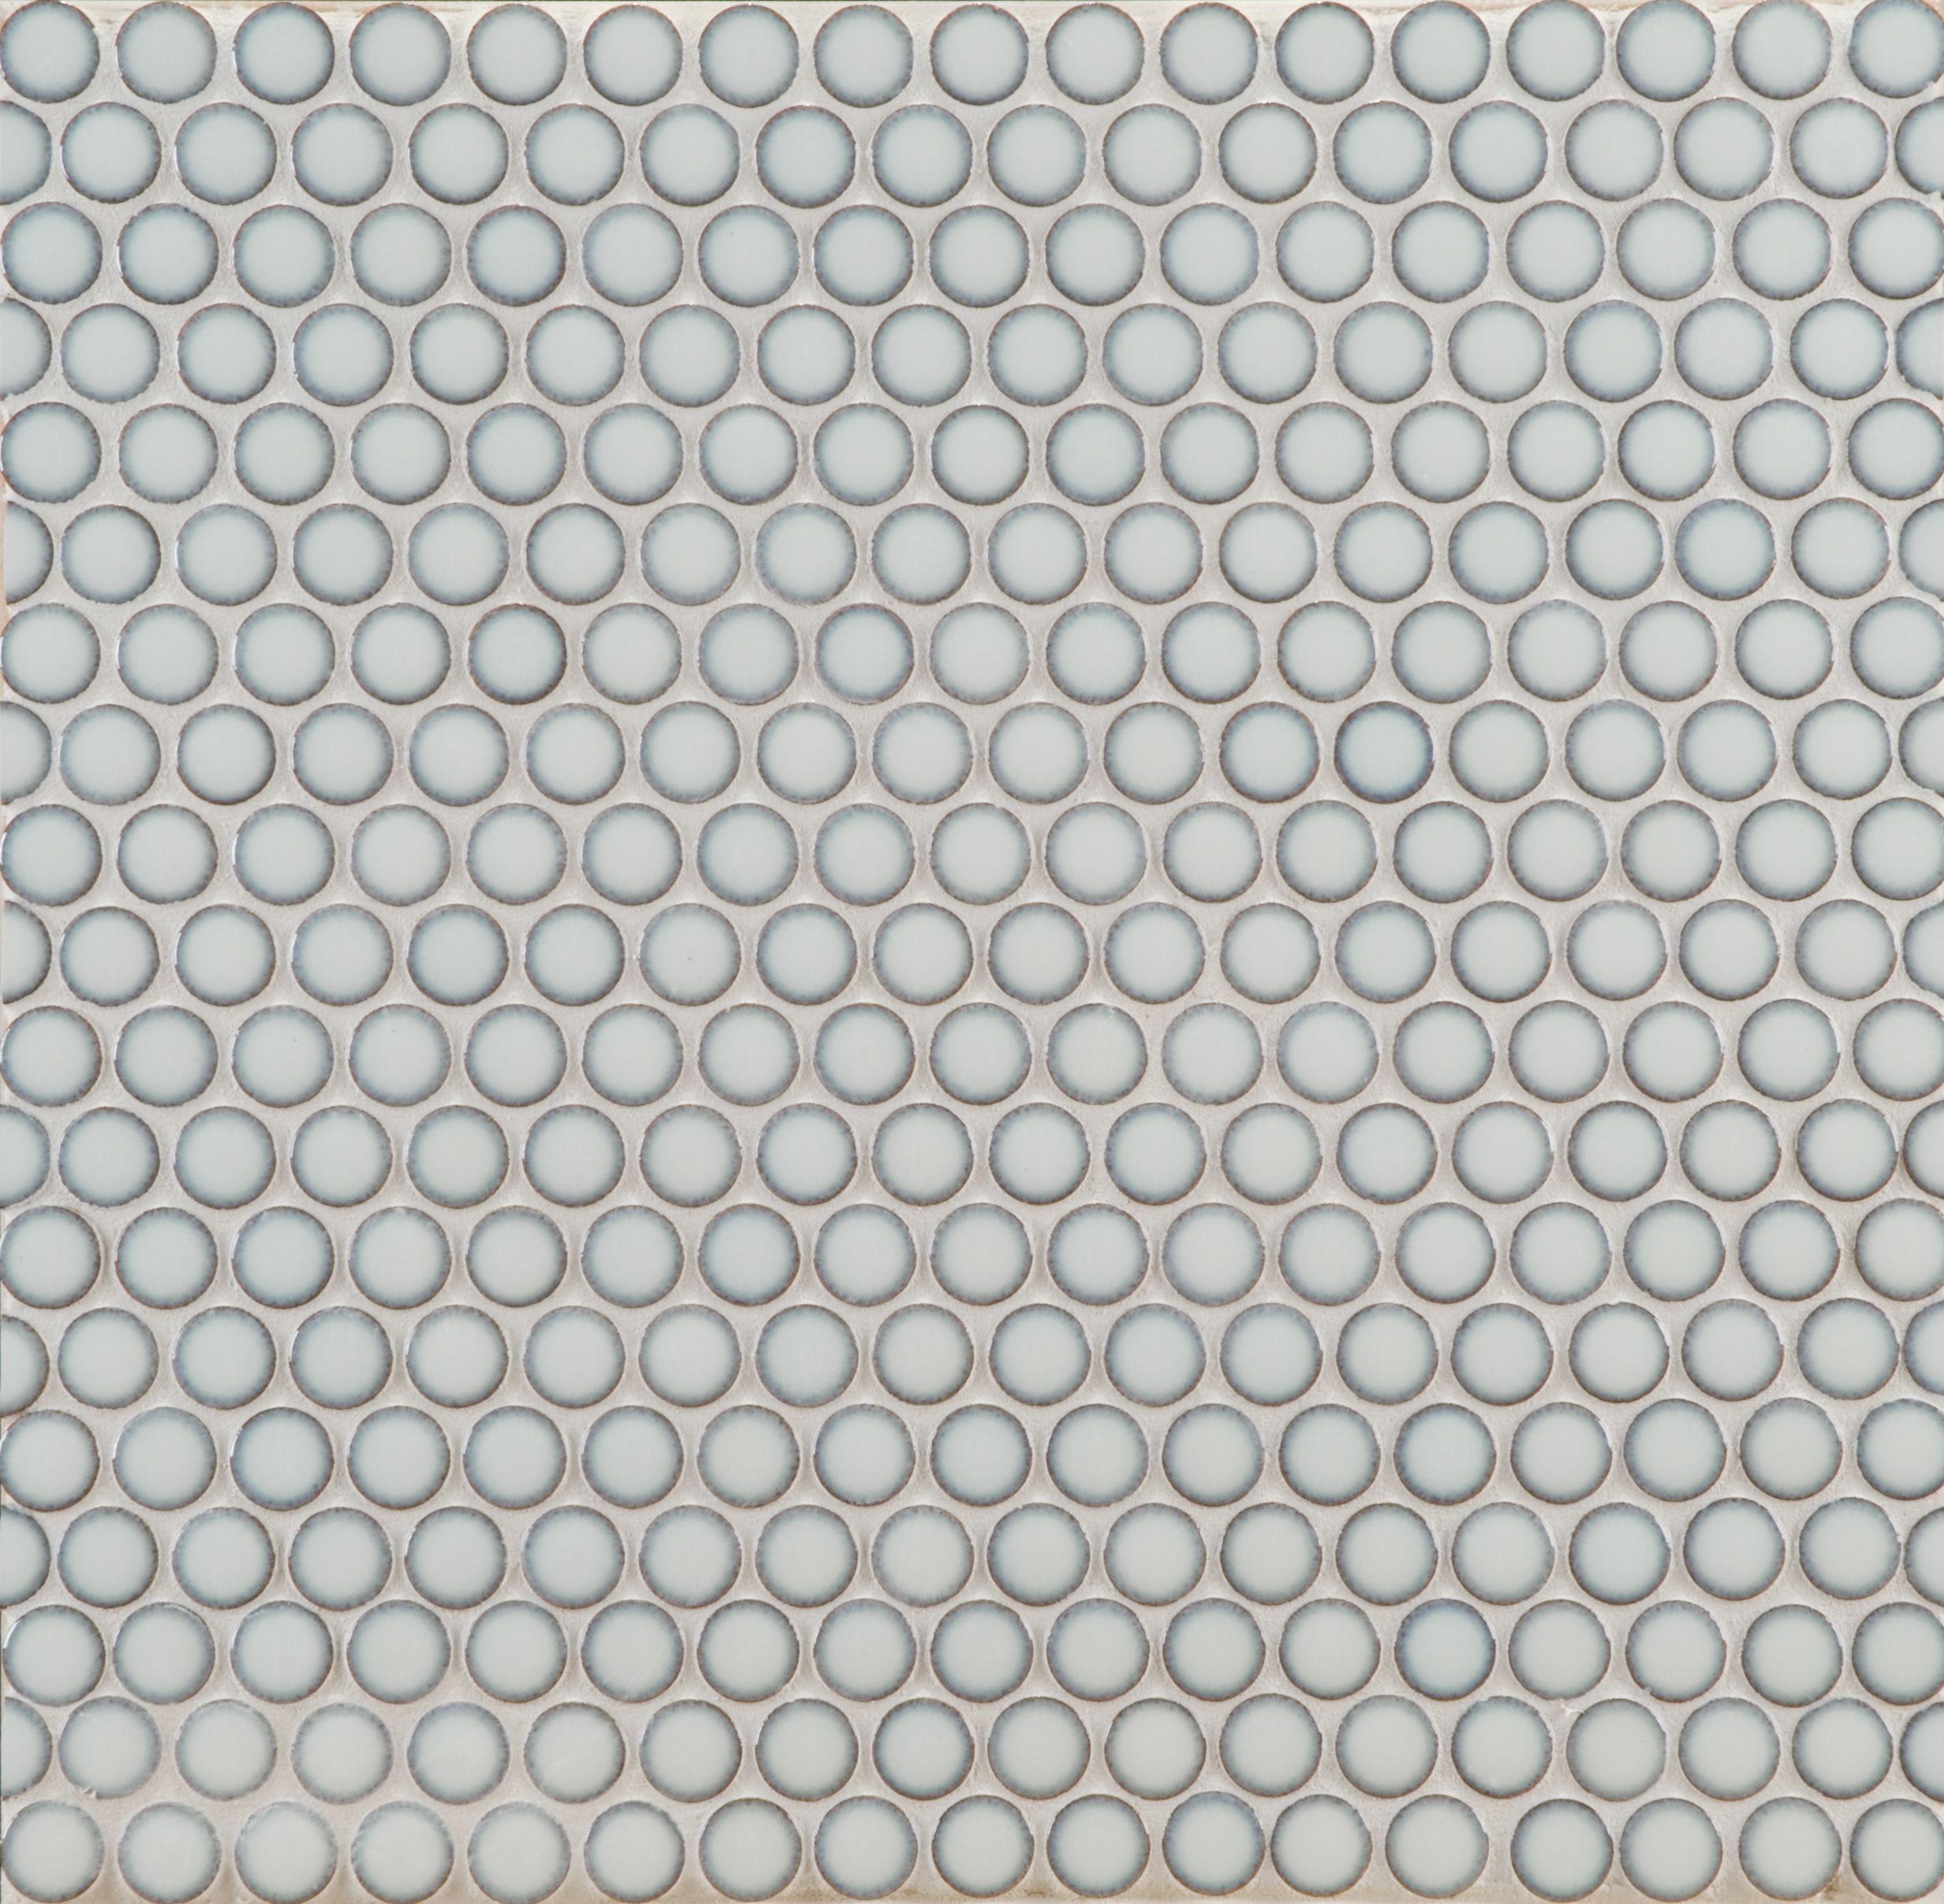 Ann Sacks Savoy Penny Round Ceramic